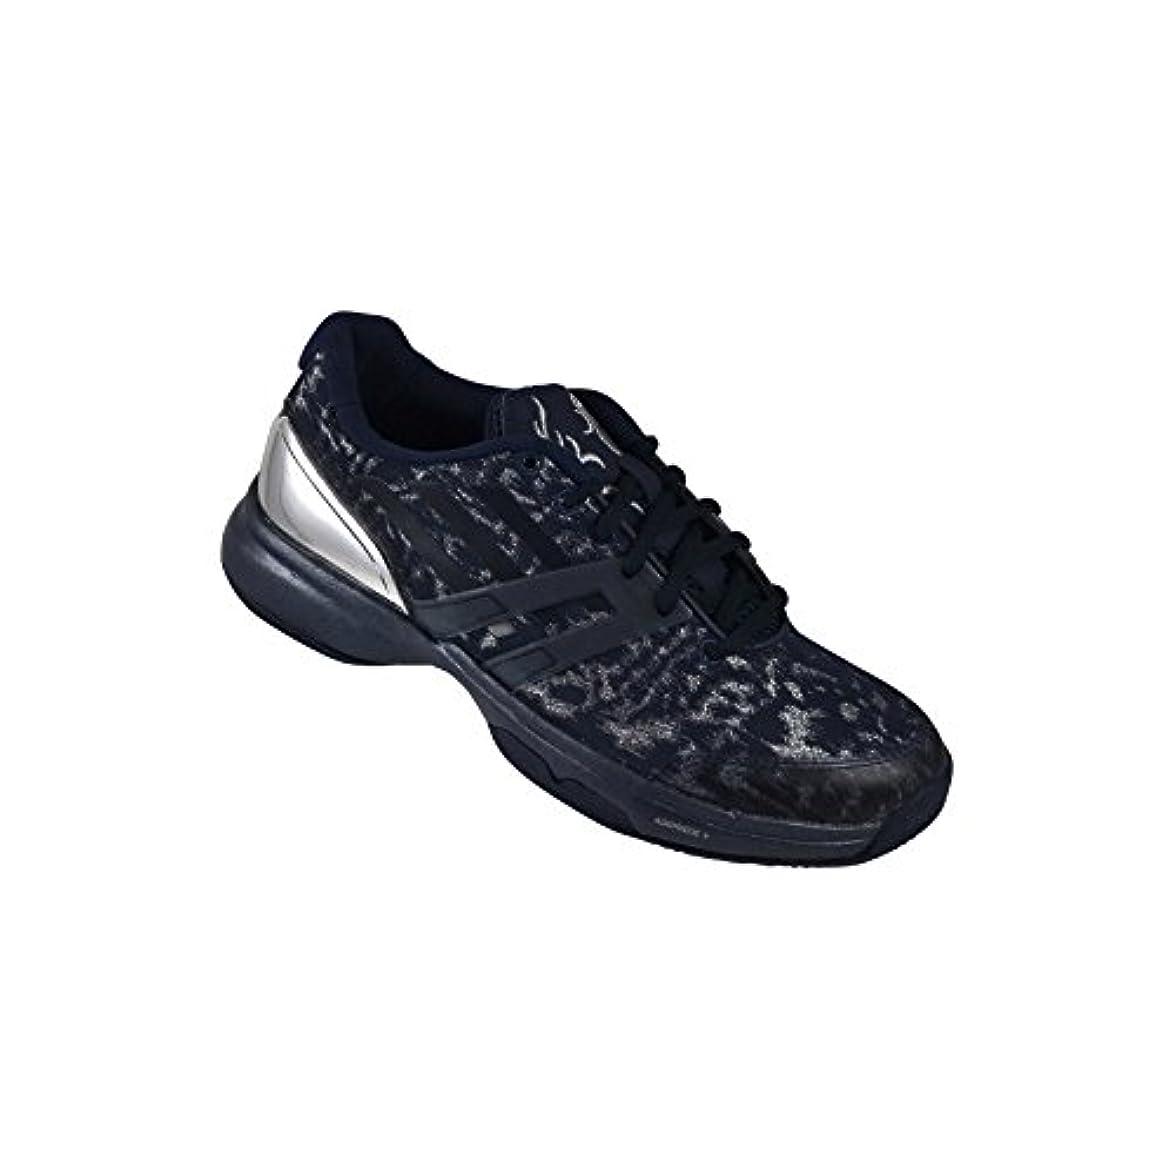 Adidas Sneaker Donna Blu Conavy conavy silvmt